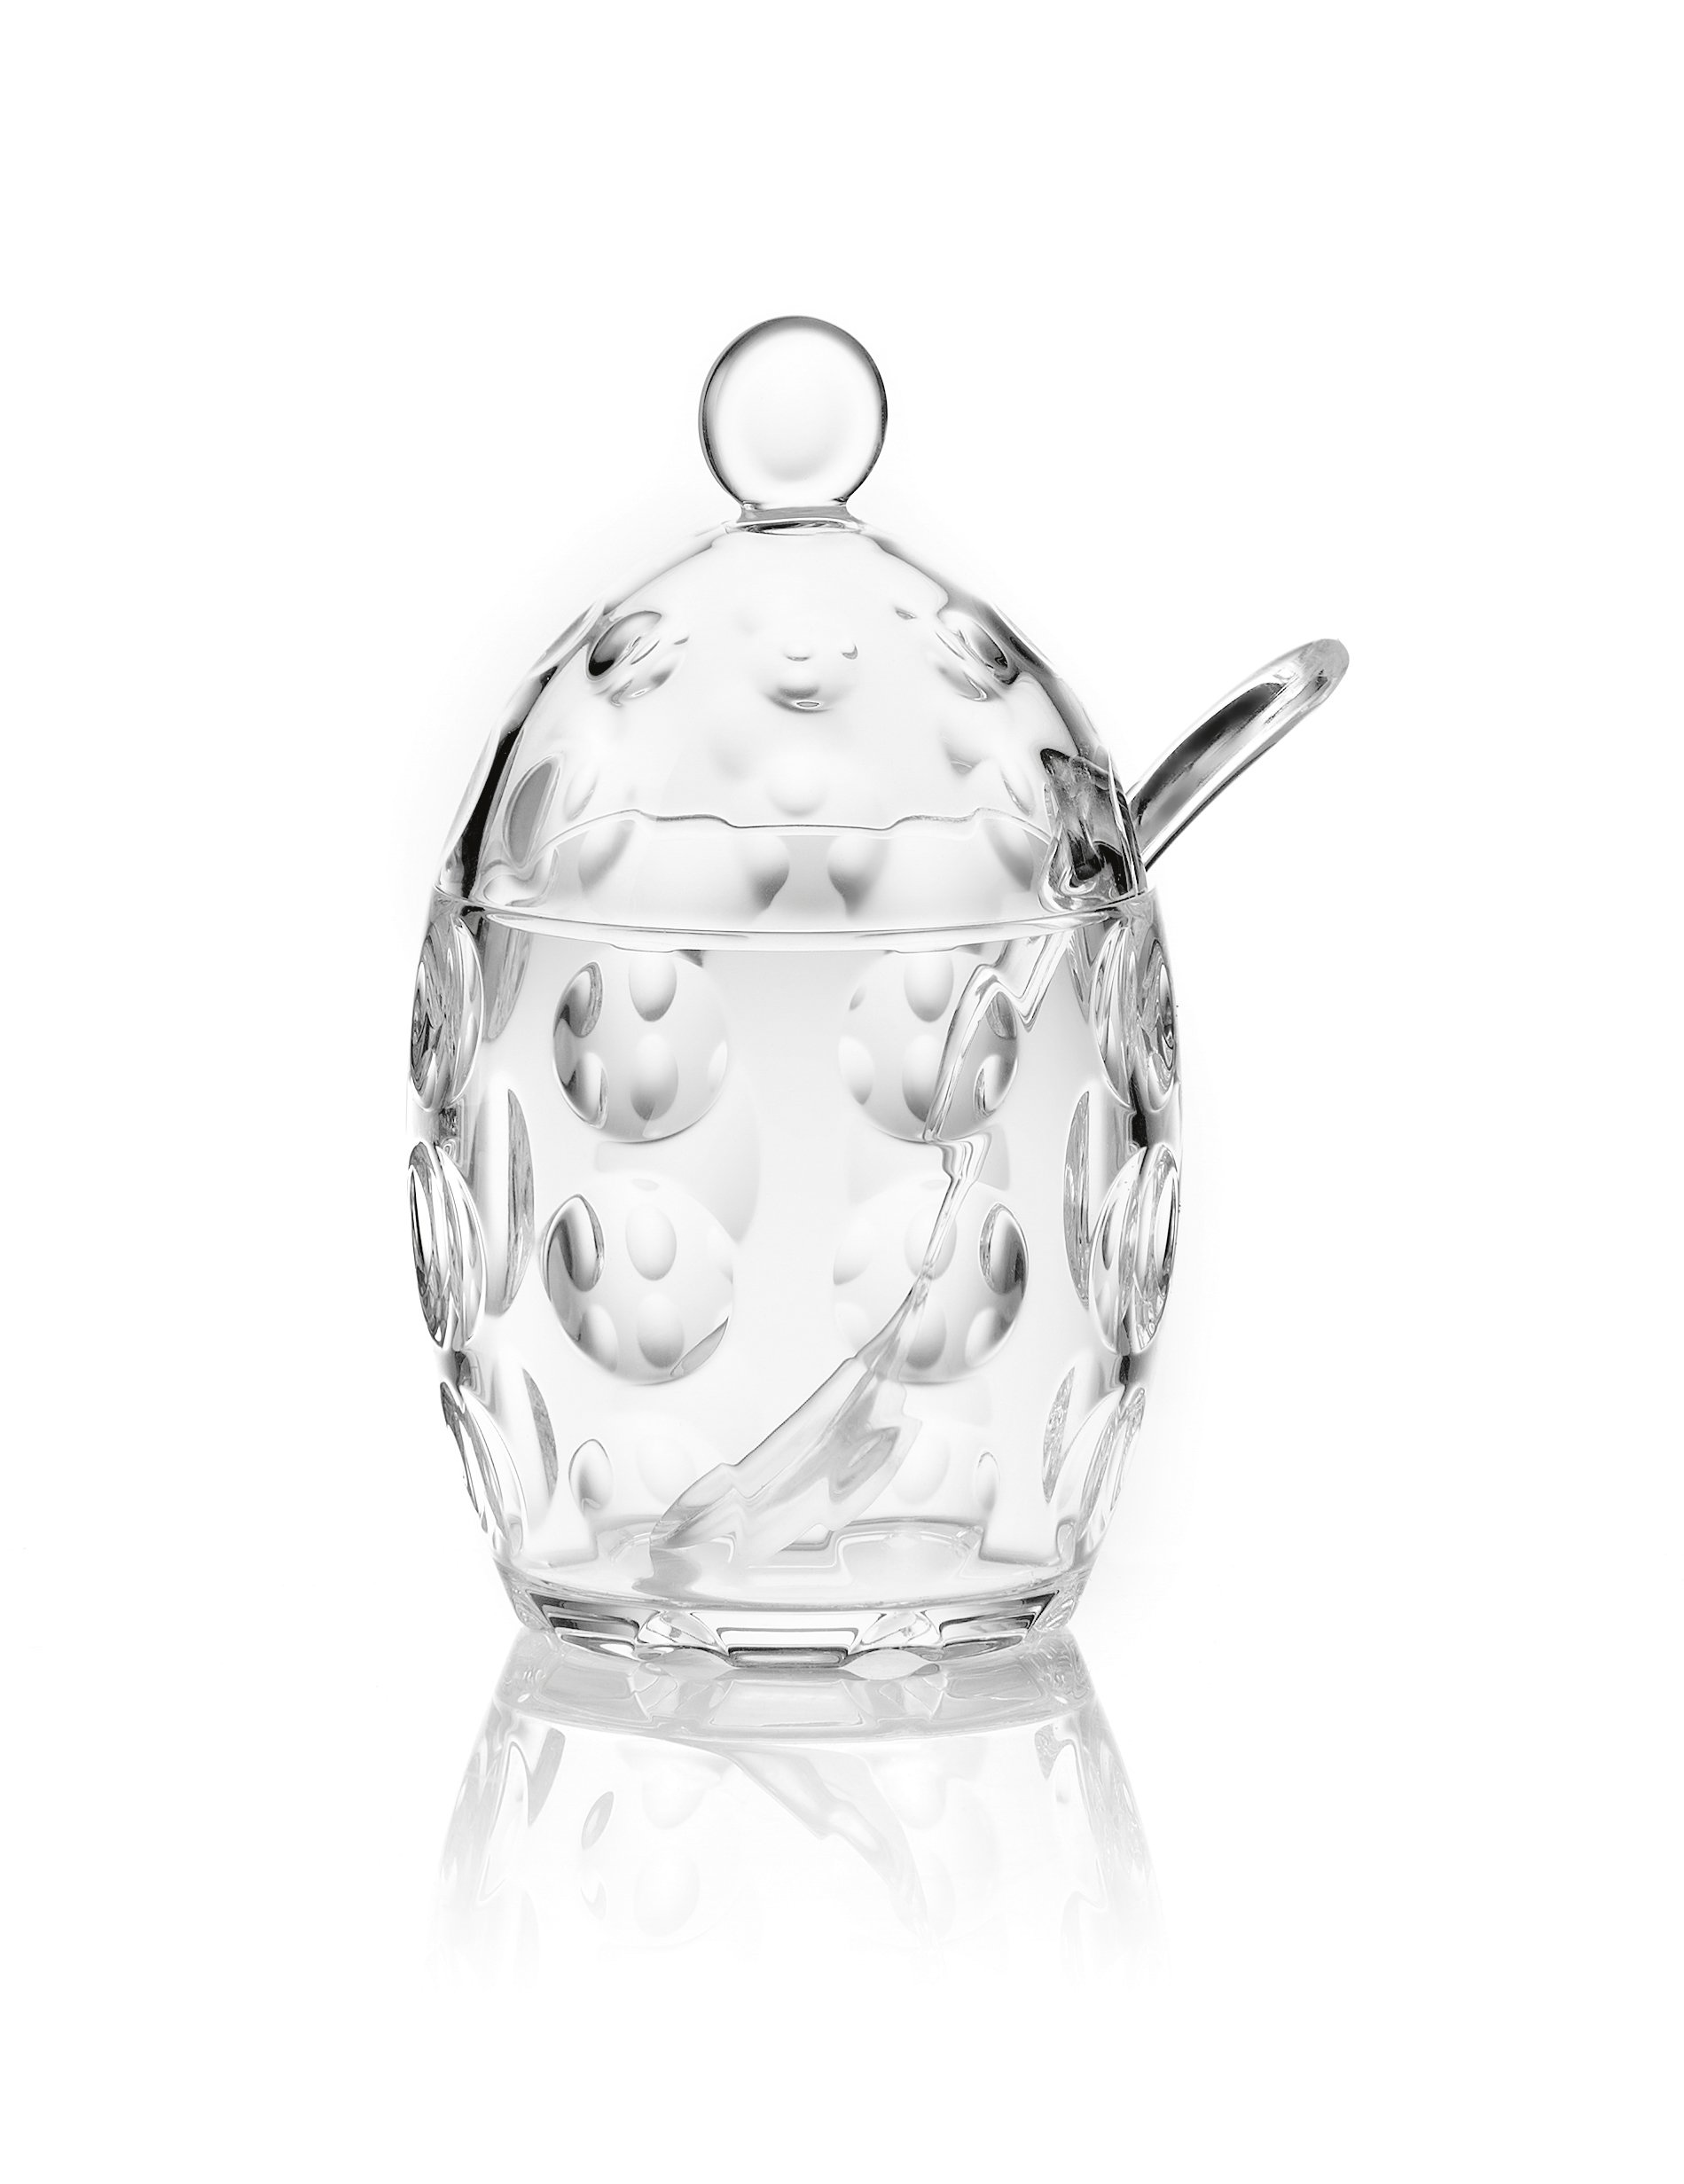 Guzzini Venice Collection Sugar Bowl with Teaspoon, 7-3/4-Fluid Ounces, Transparent